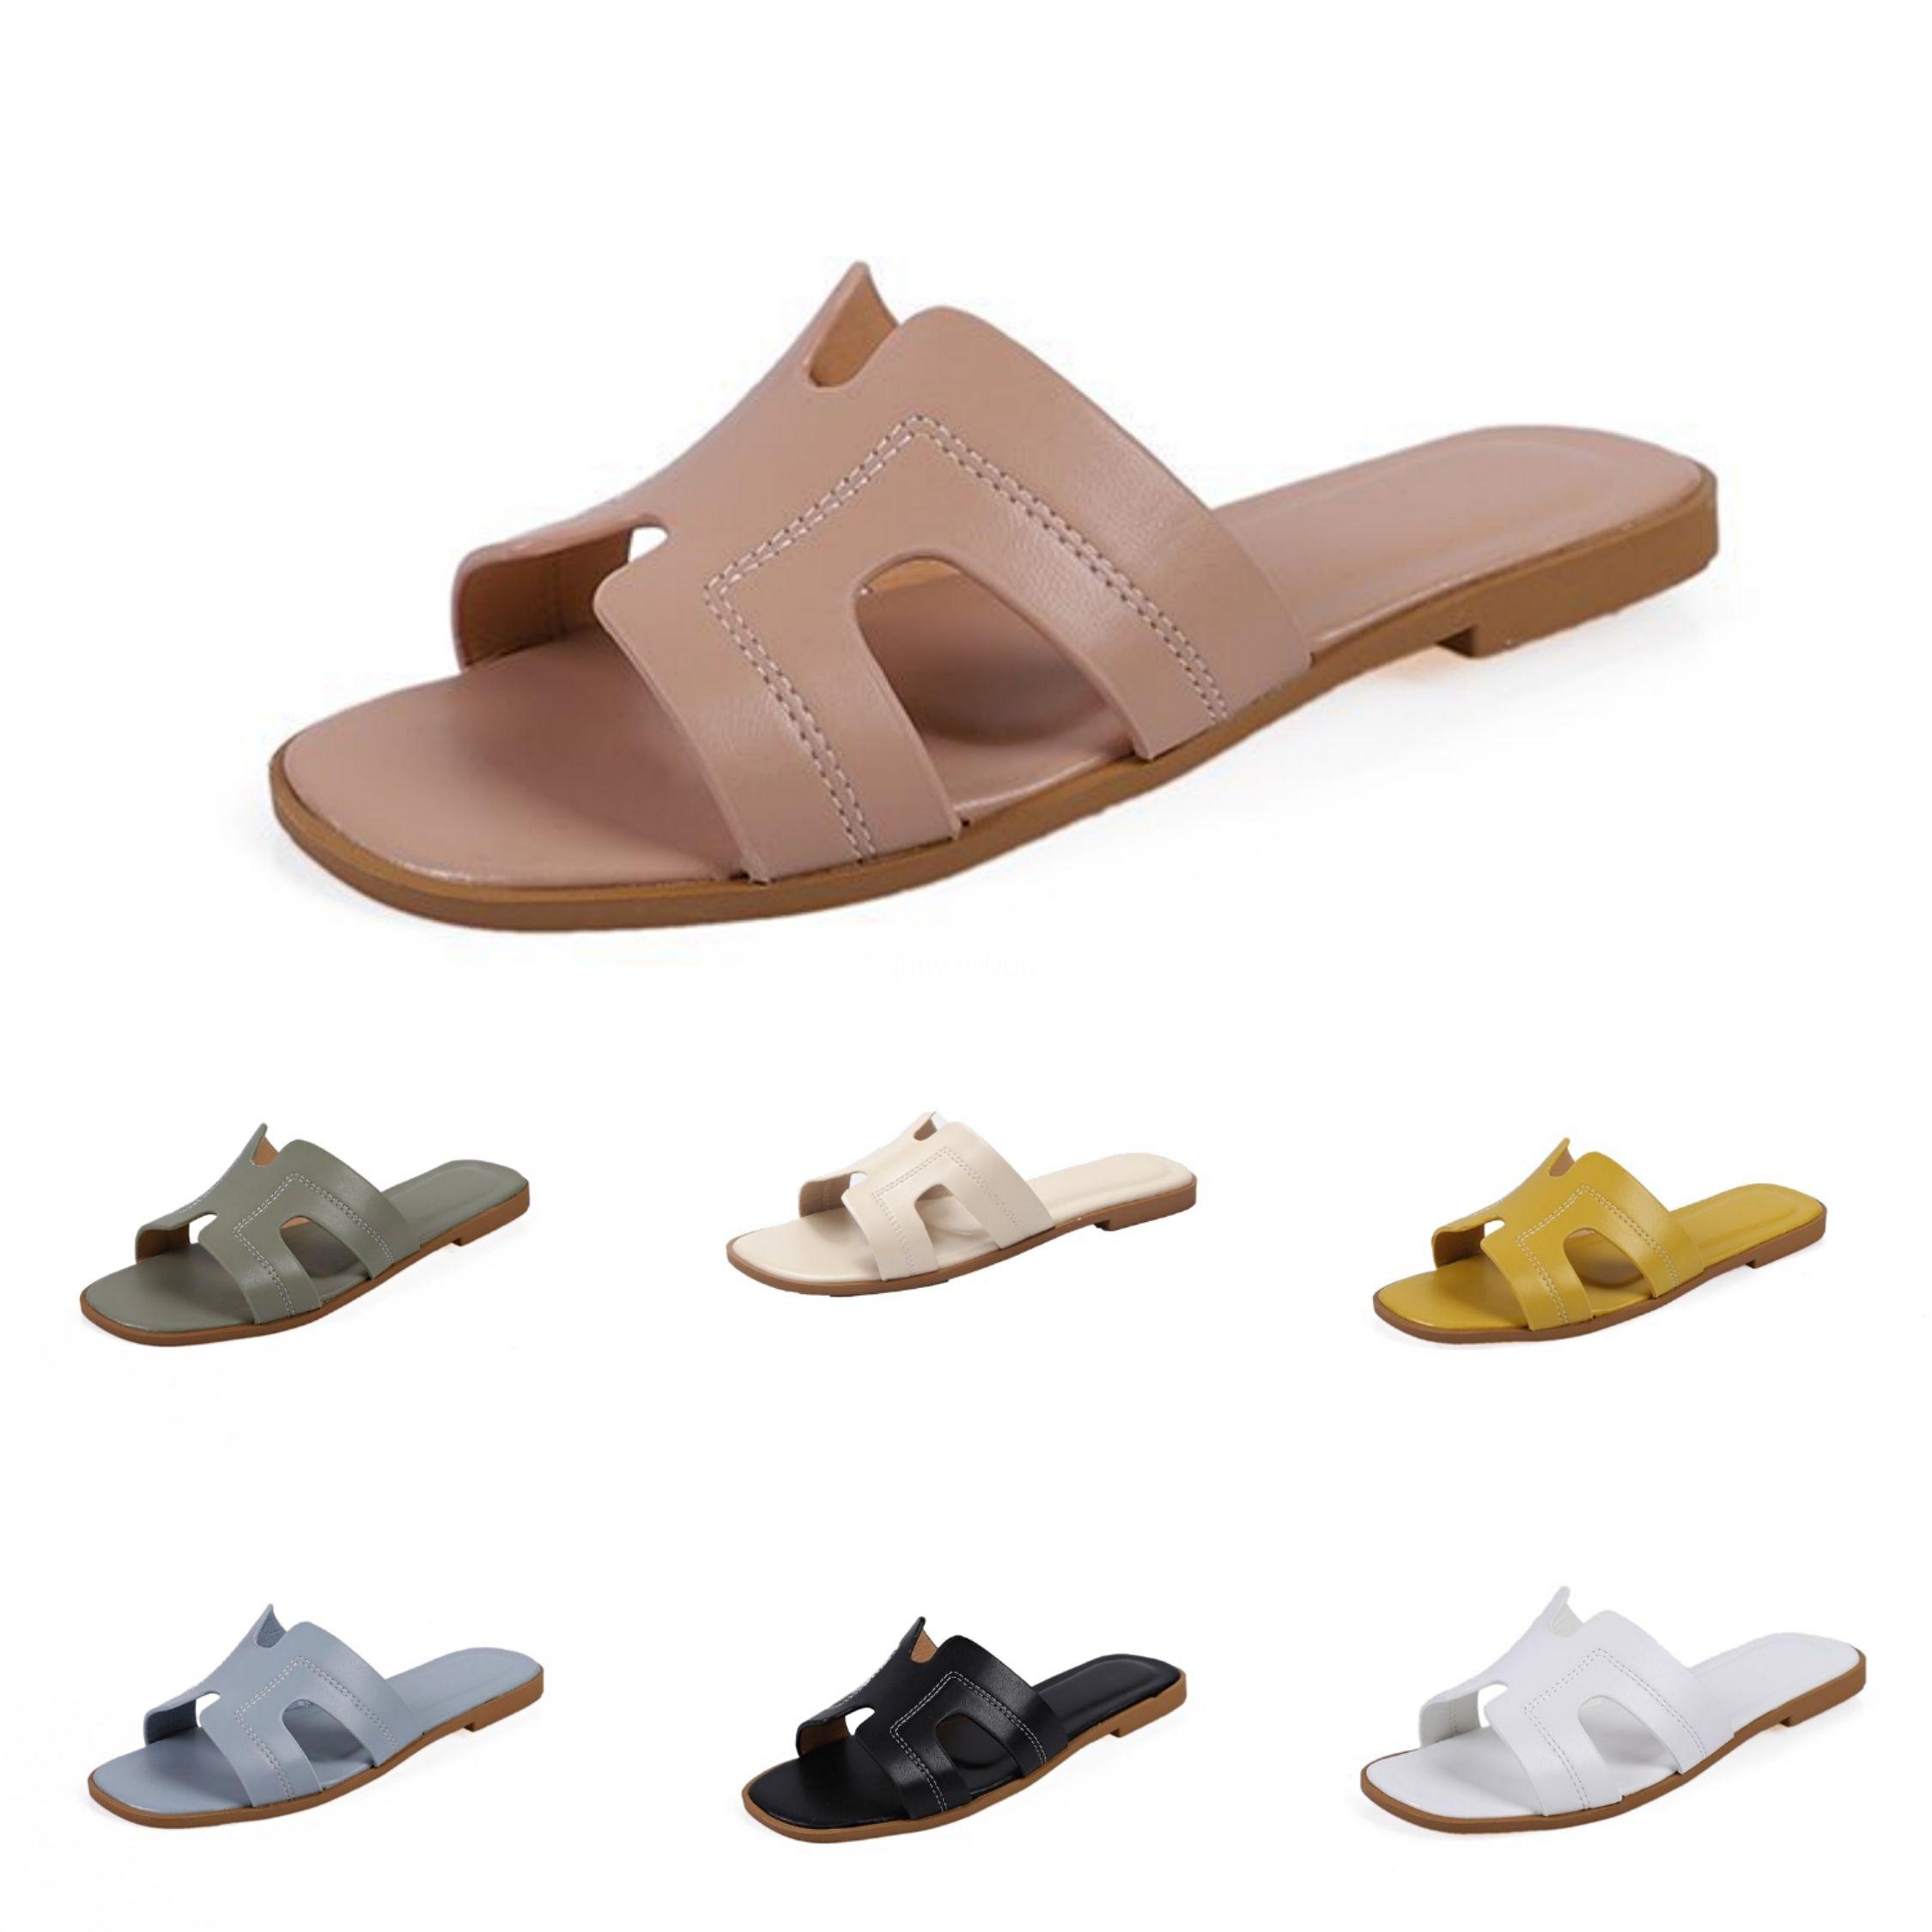 Male Monkey 821559 New Women Retro Sweetness Platform Slippers Summer 2020 High Heels Slippers Ladies Outdoor Fashion#782